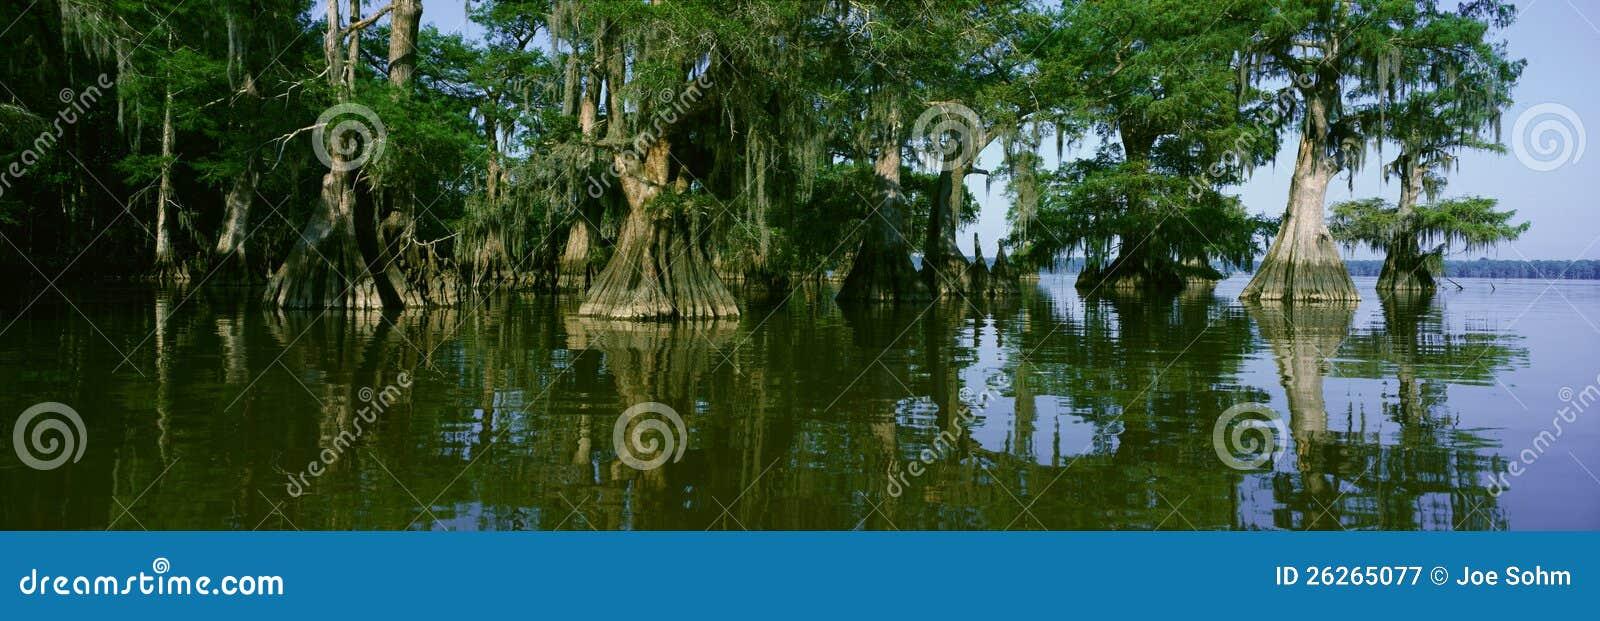 Parque de estado de Fausse Pointe do lago